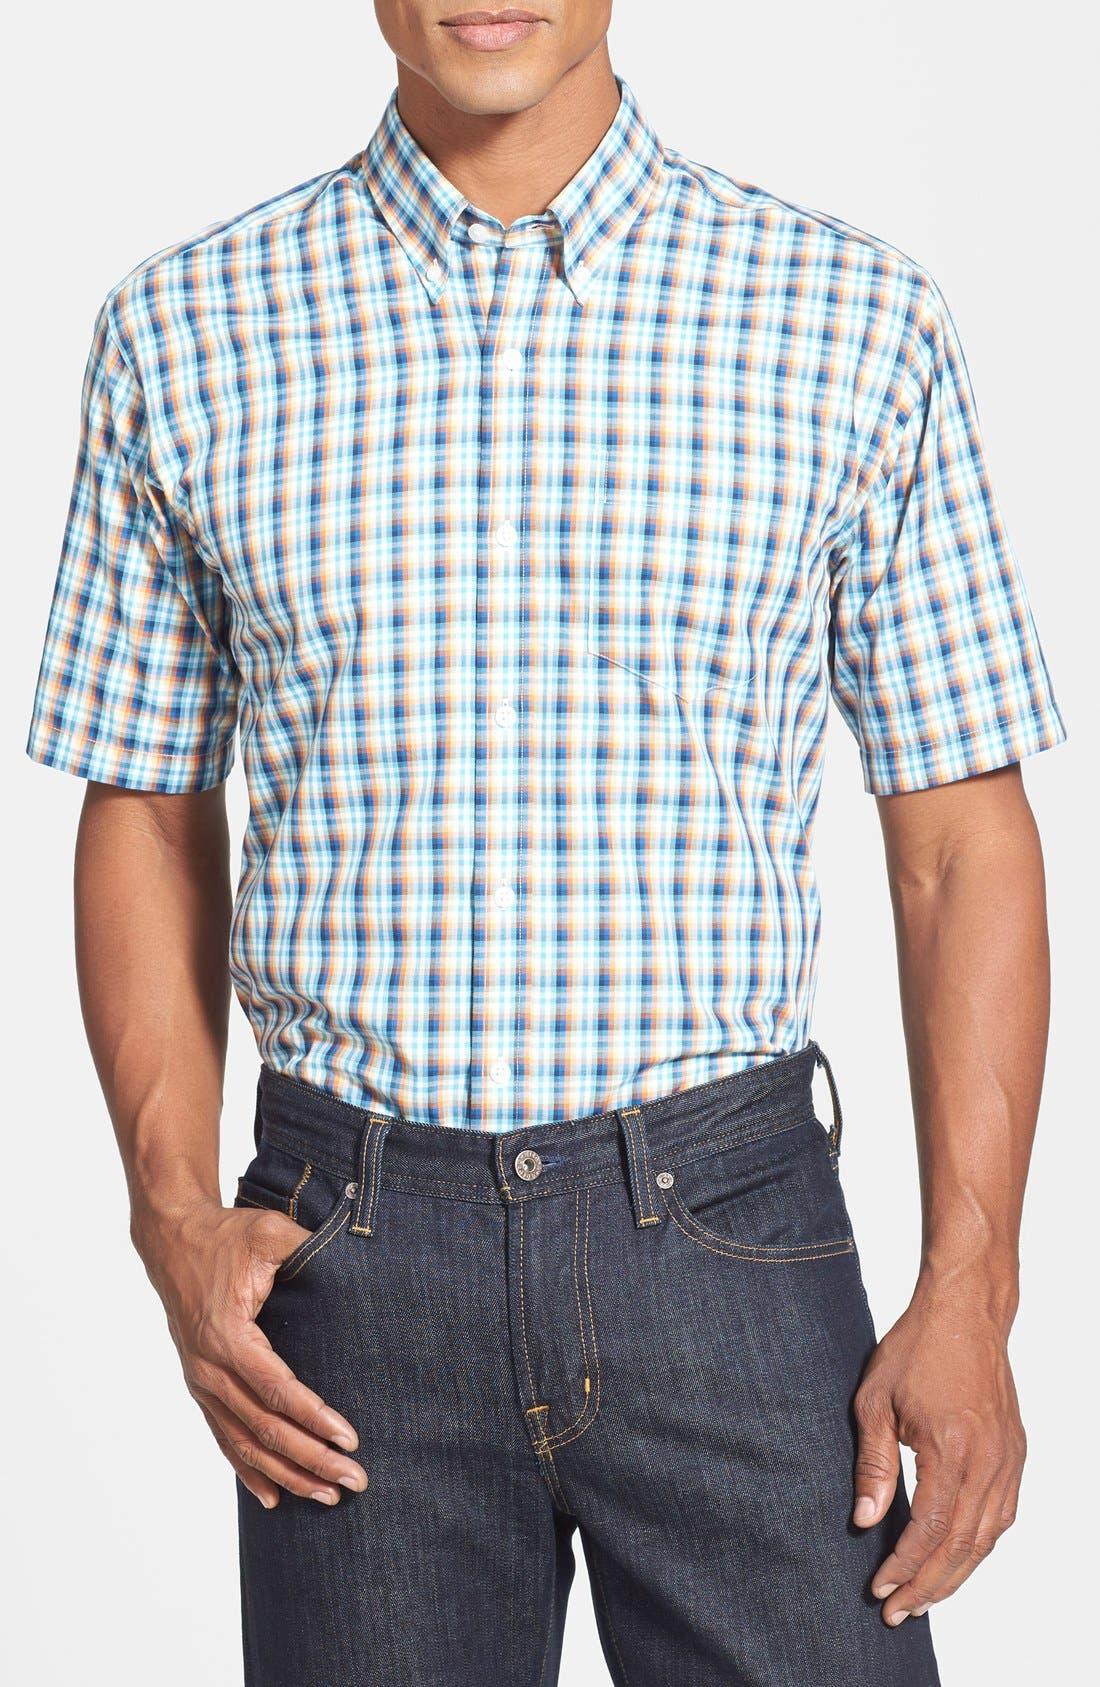 Alternate Image 1 Selected - Cutter & Buck 'Morton Road' Classic Fit Short Sleeve Plaid Sport Shirt (Big & Tall)